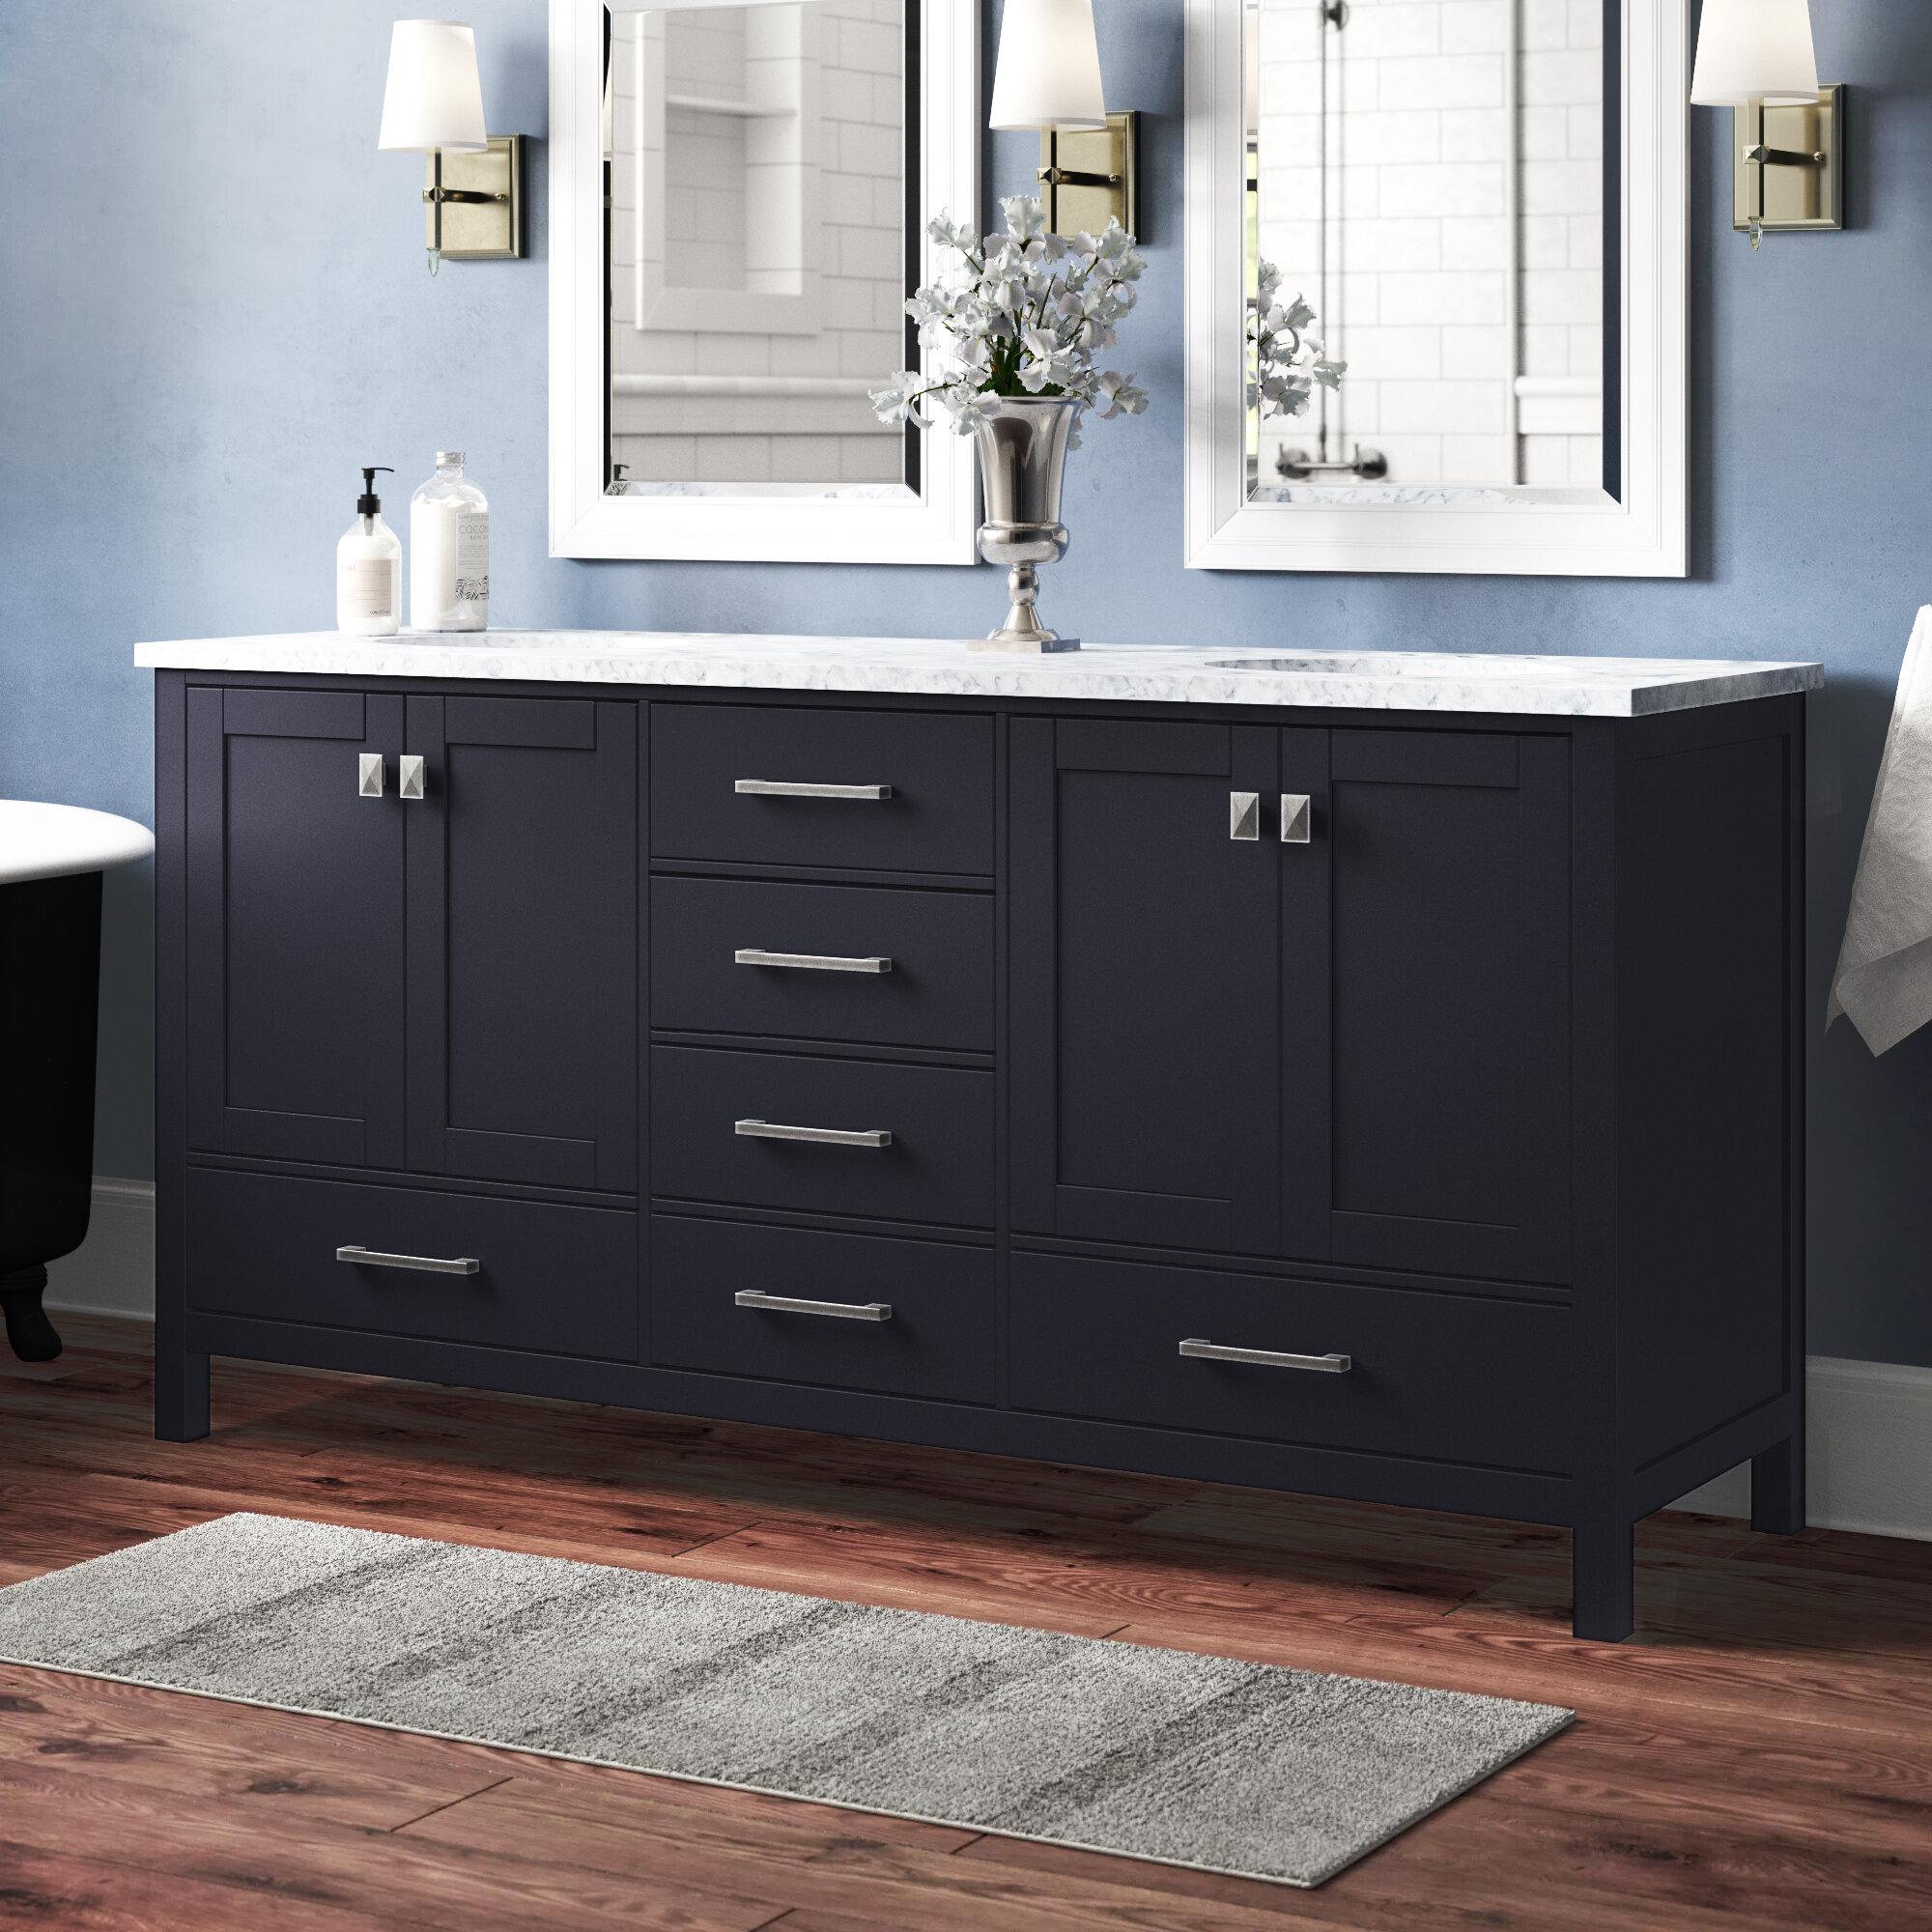 Contemporary Office Interior Design, Darby Home Co Bowlin 72 Double Sink Bathroom Vanity Reviews Wayfair